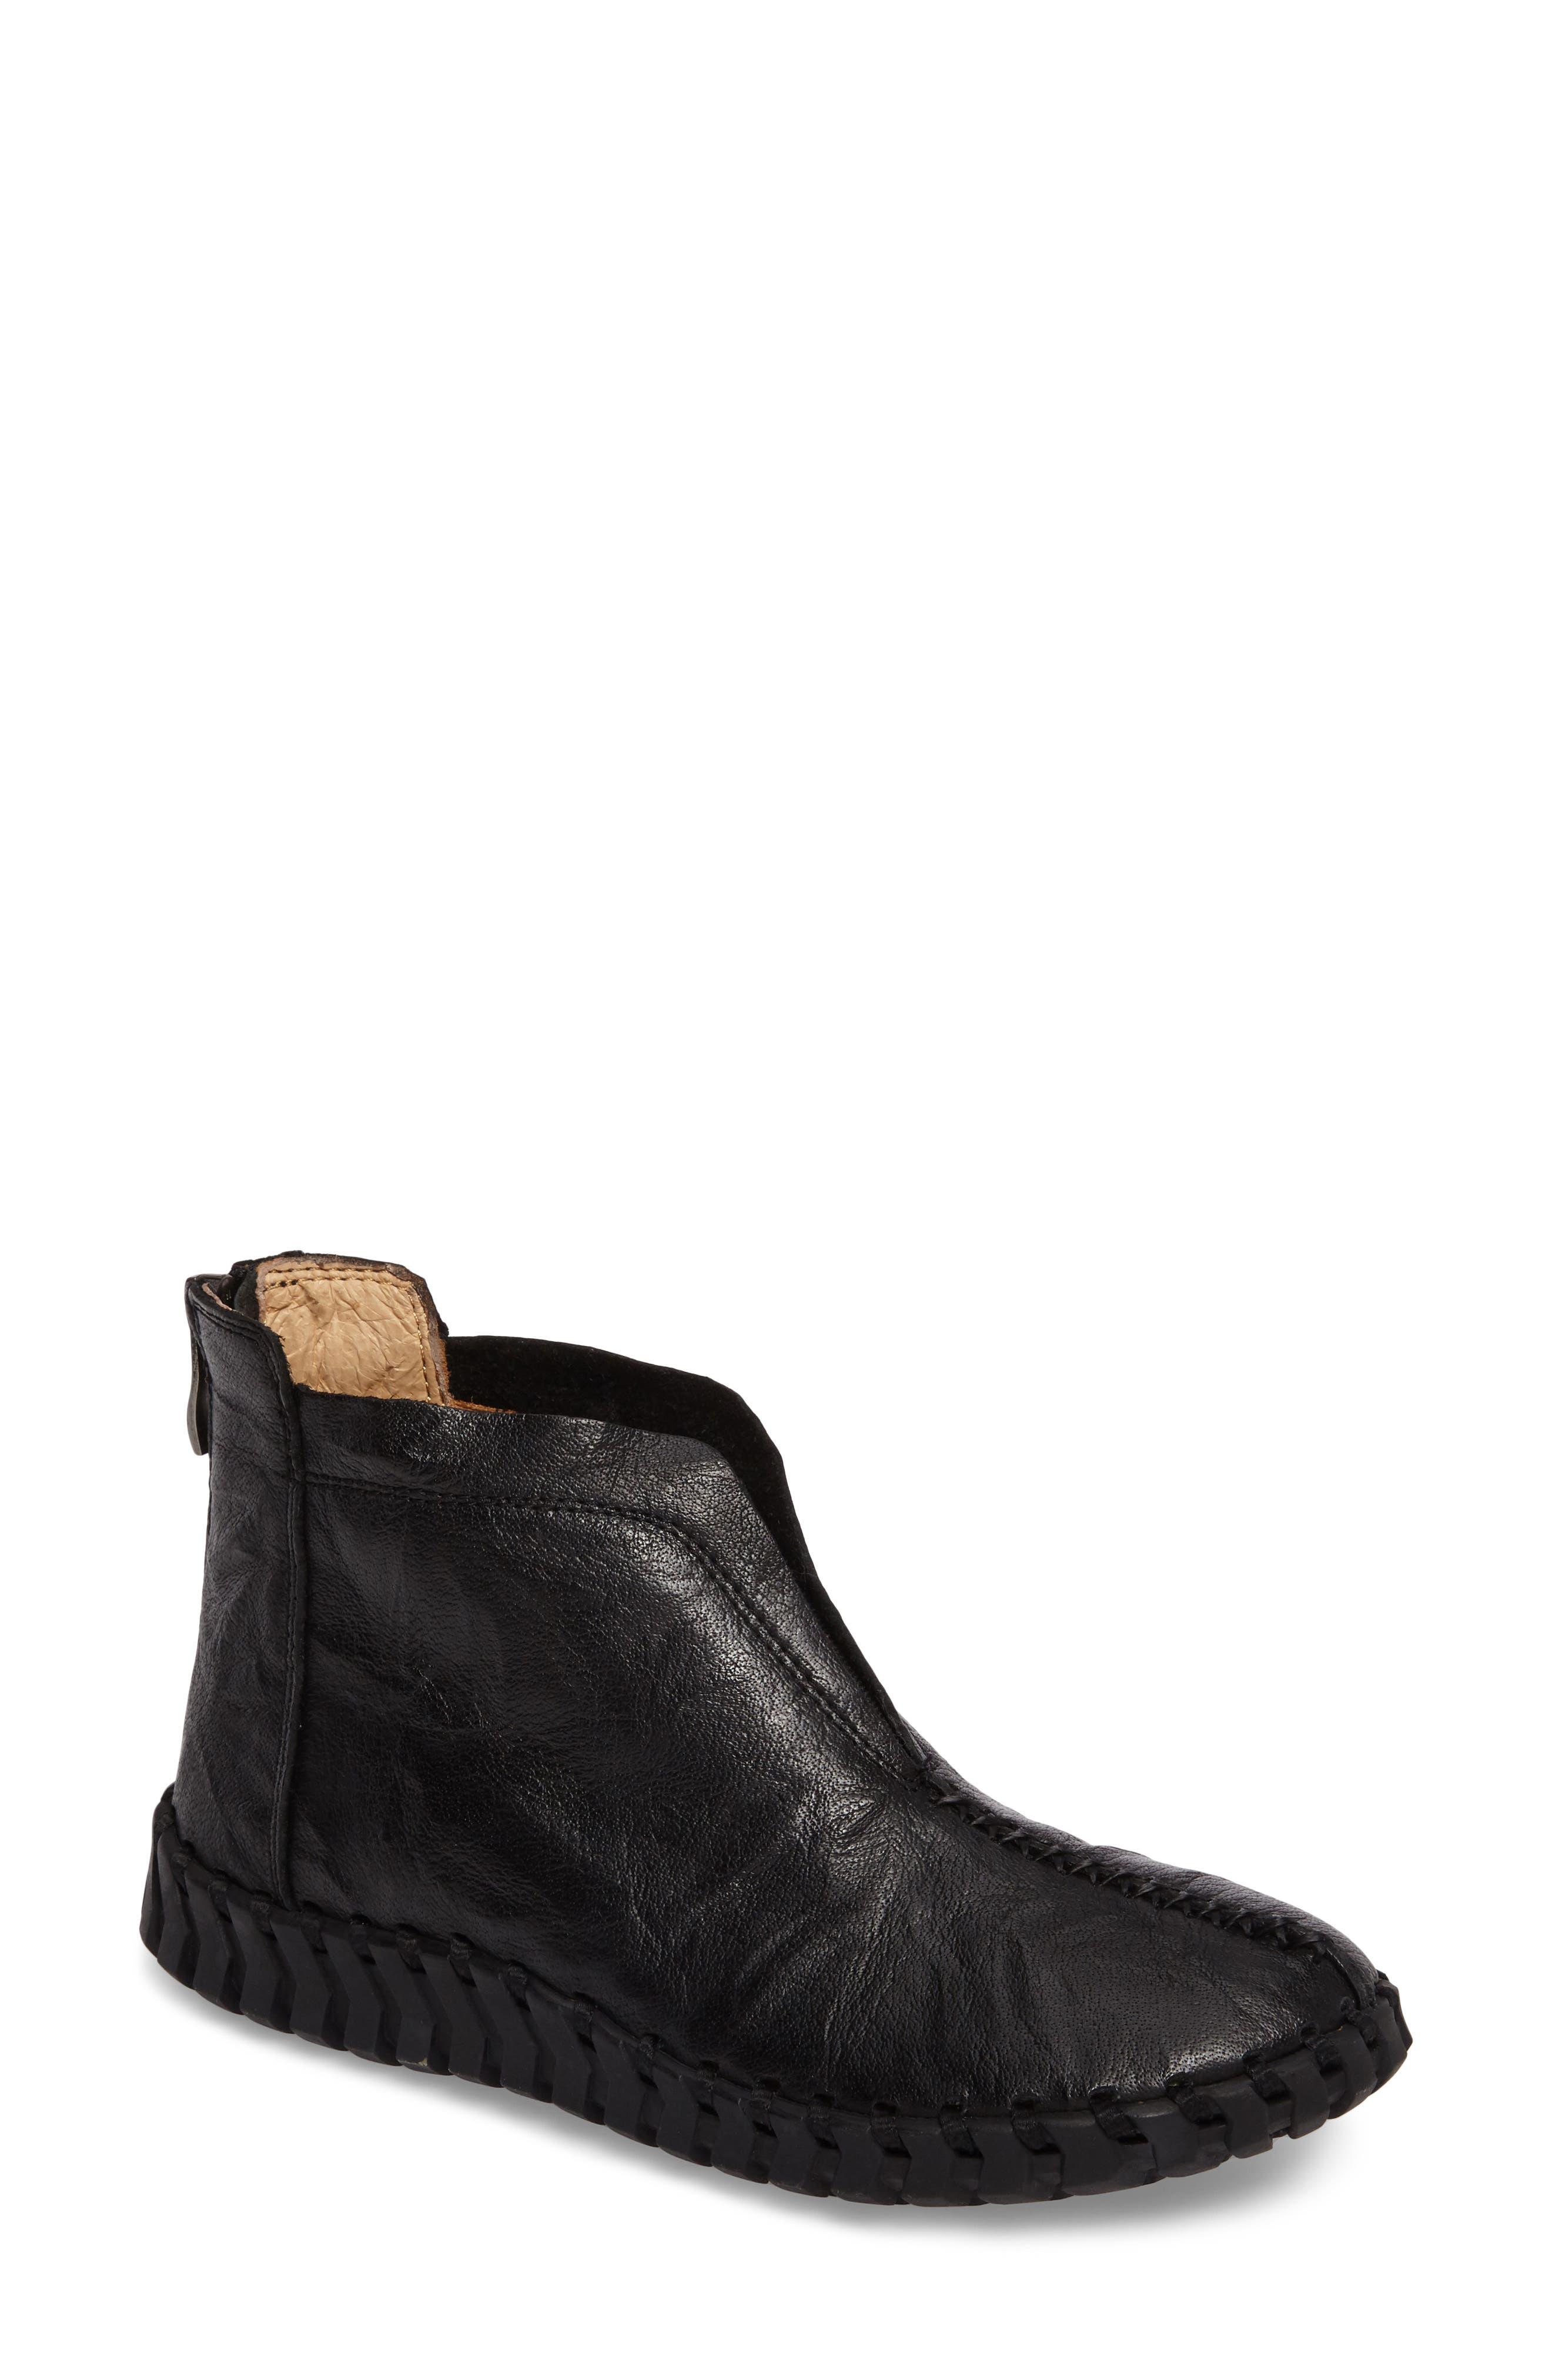 TW79 Bootie,                         Main,                         color, Black Leather